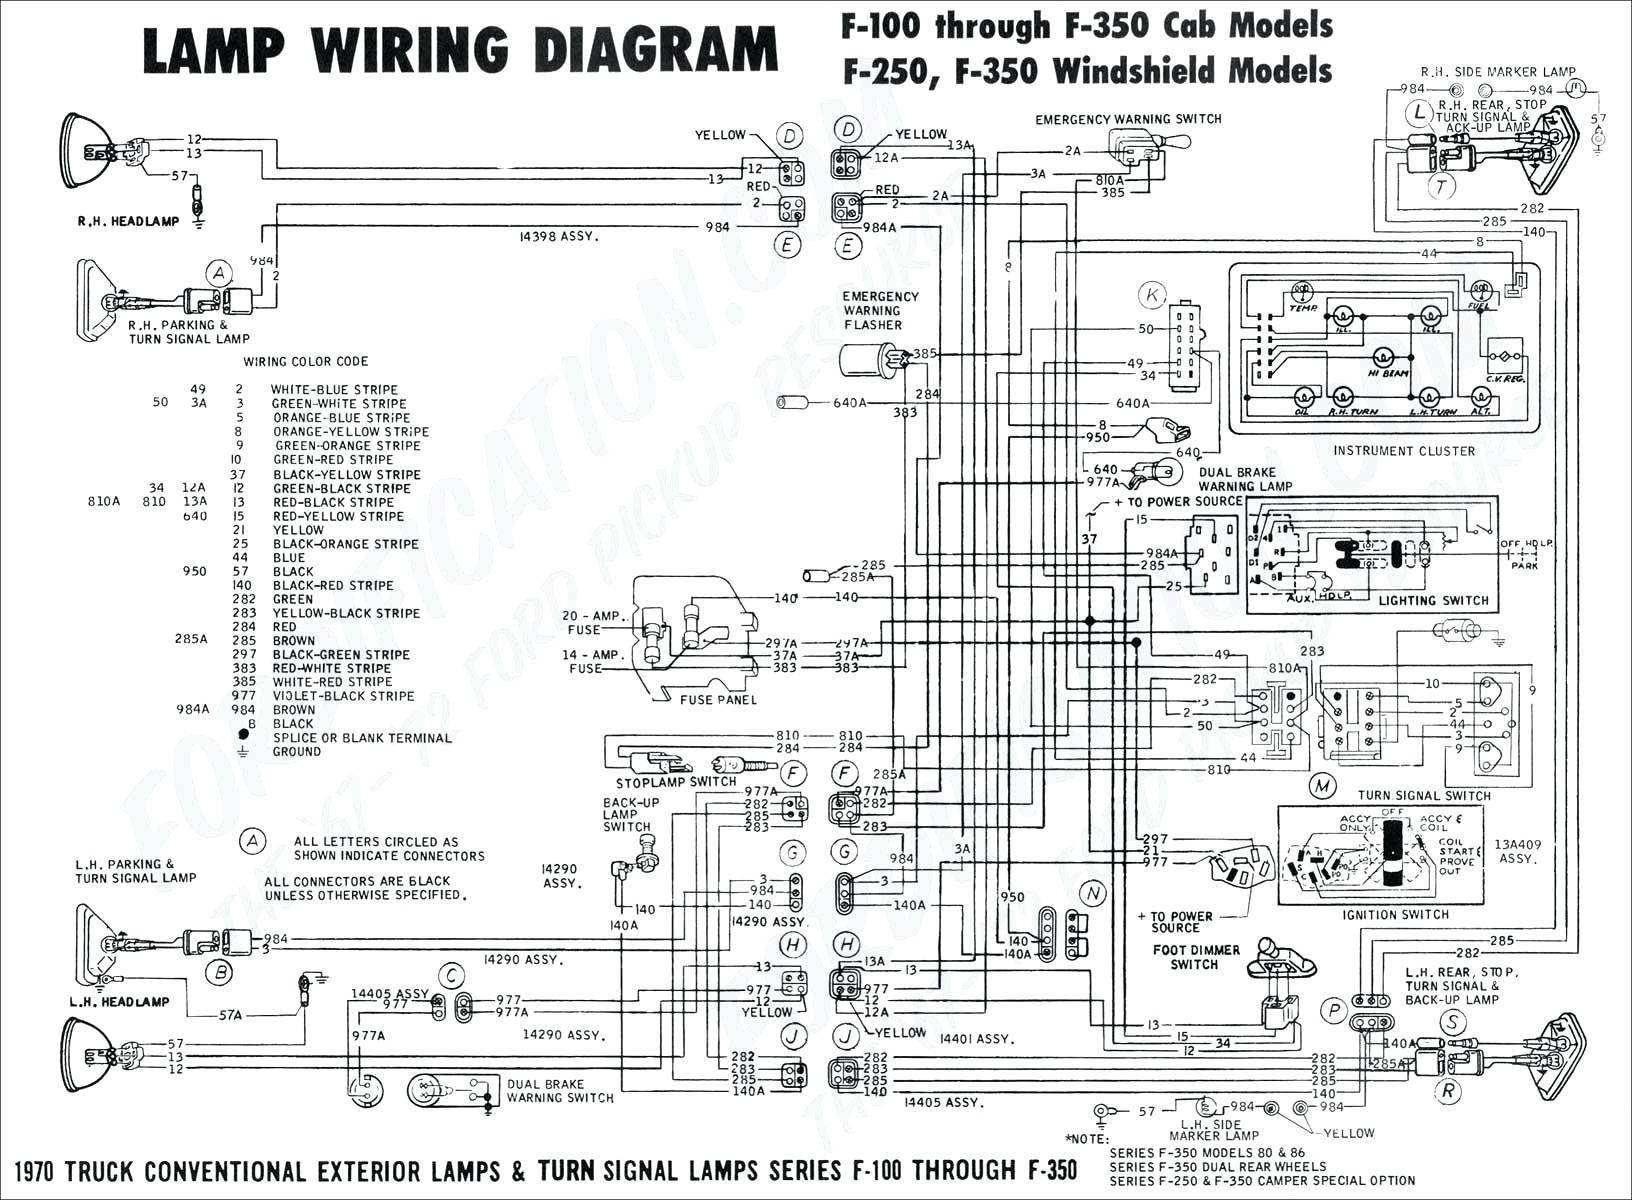 1996 dodge dakota tail light wiring